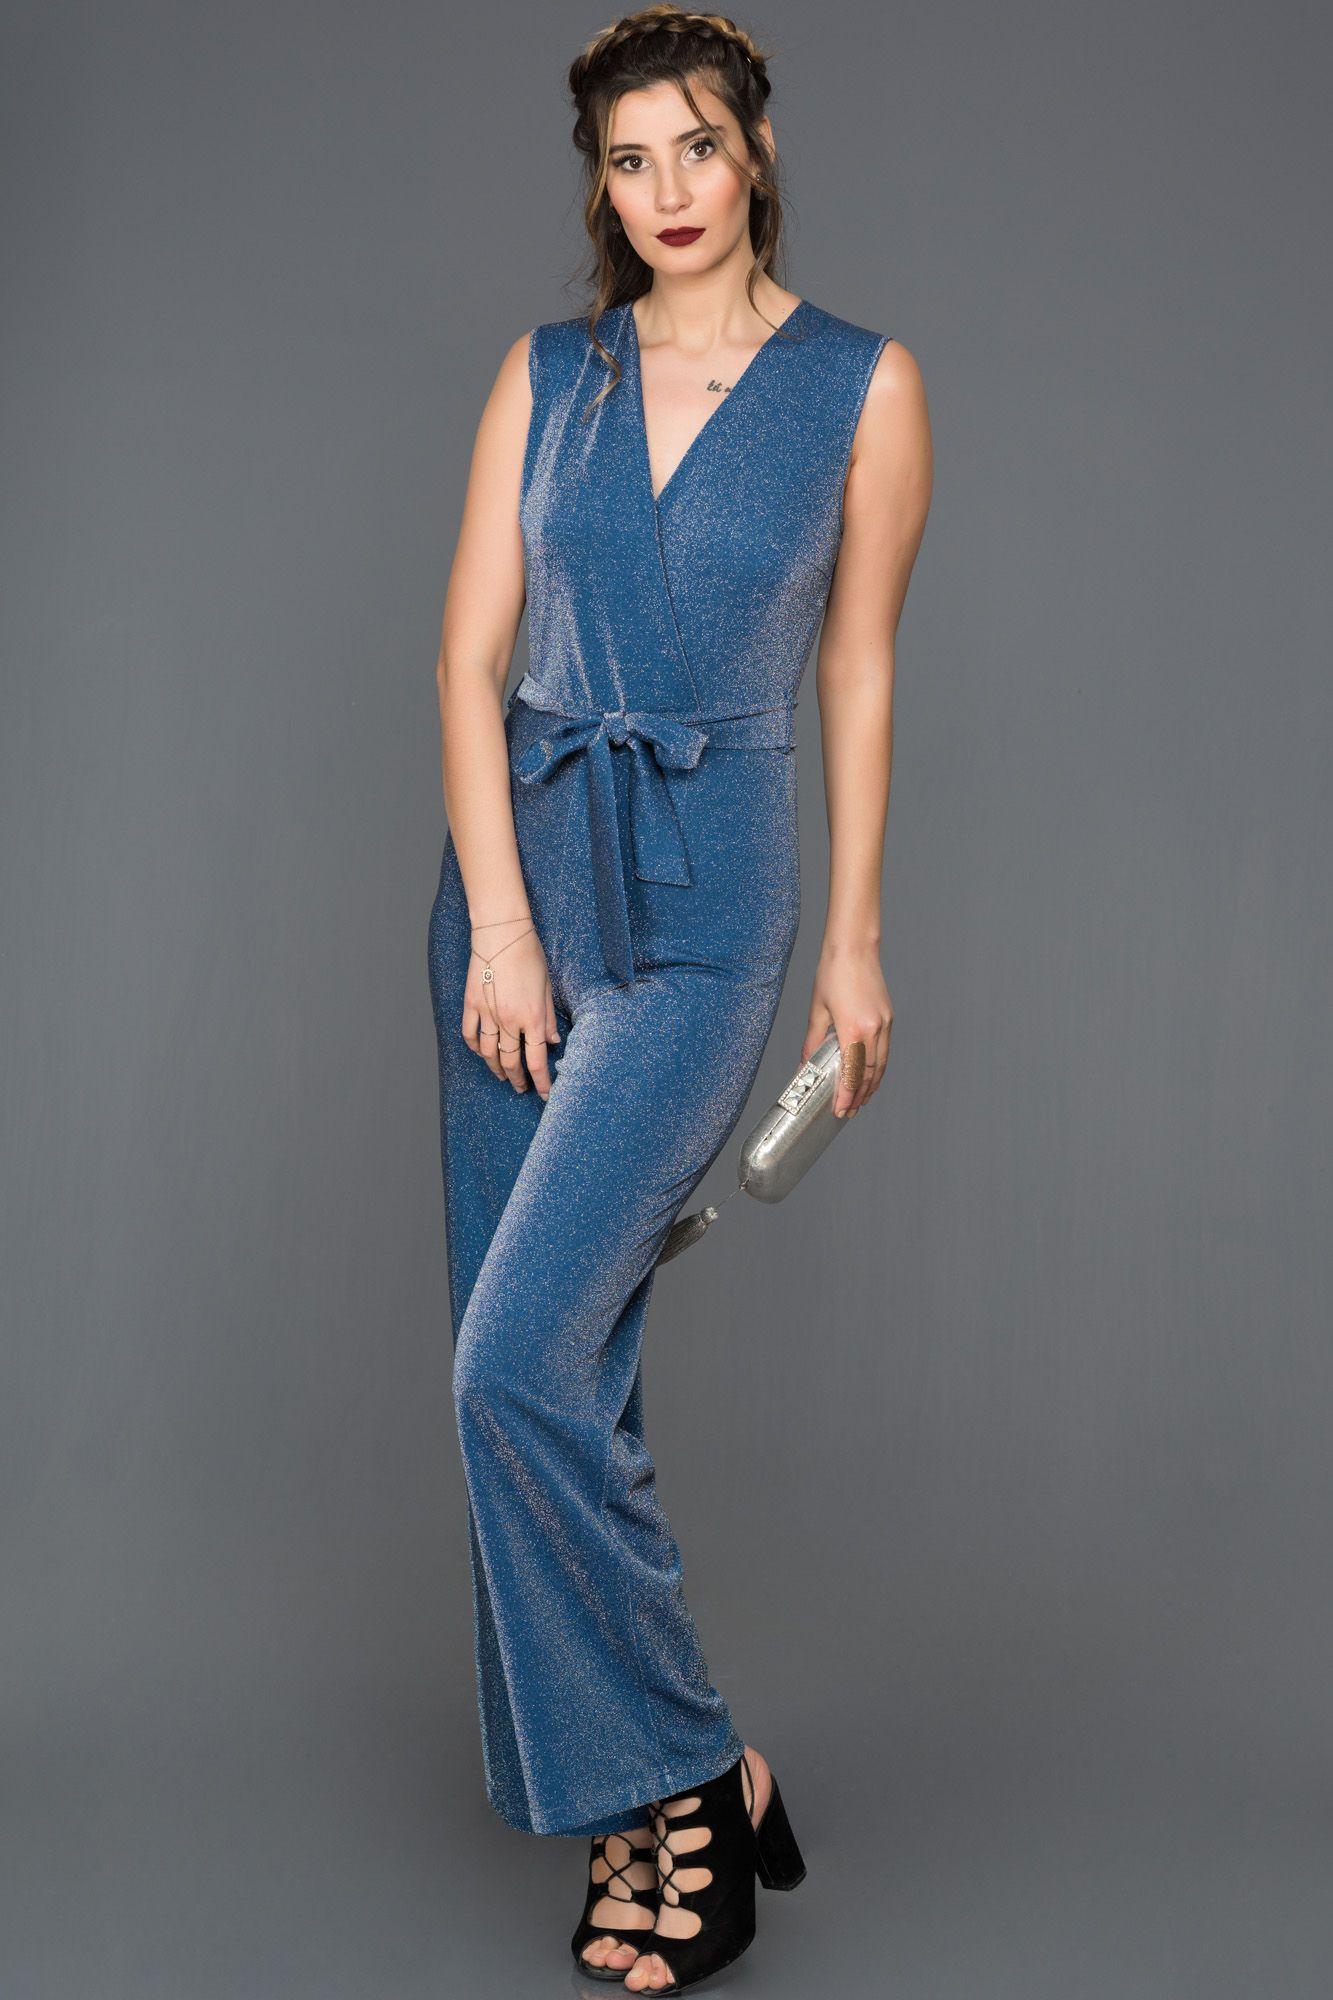 6f558614ed794 V Yaka Simli Tulum AR37079 | LADY İN BLUE | Tulum, Elbiseler, Elbise ...